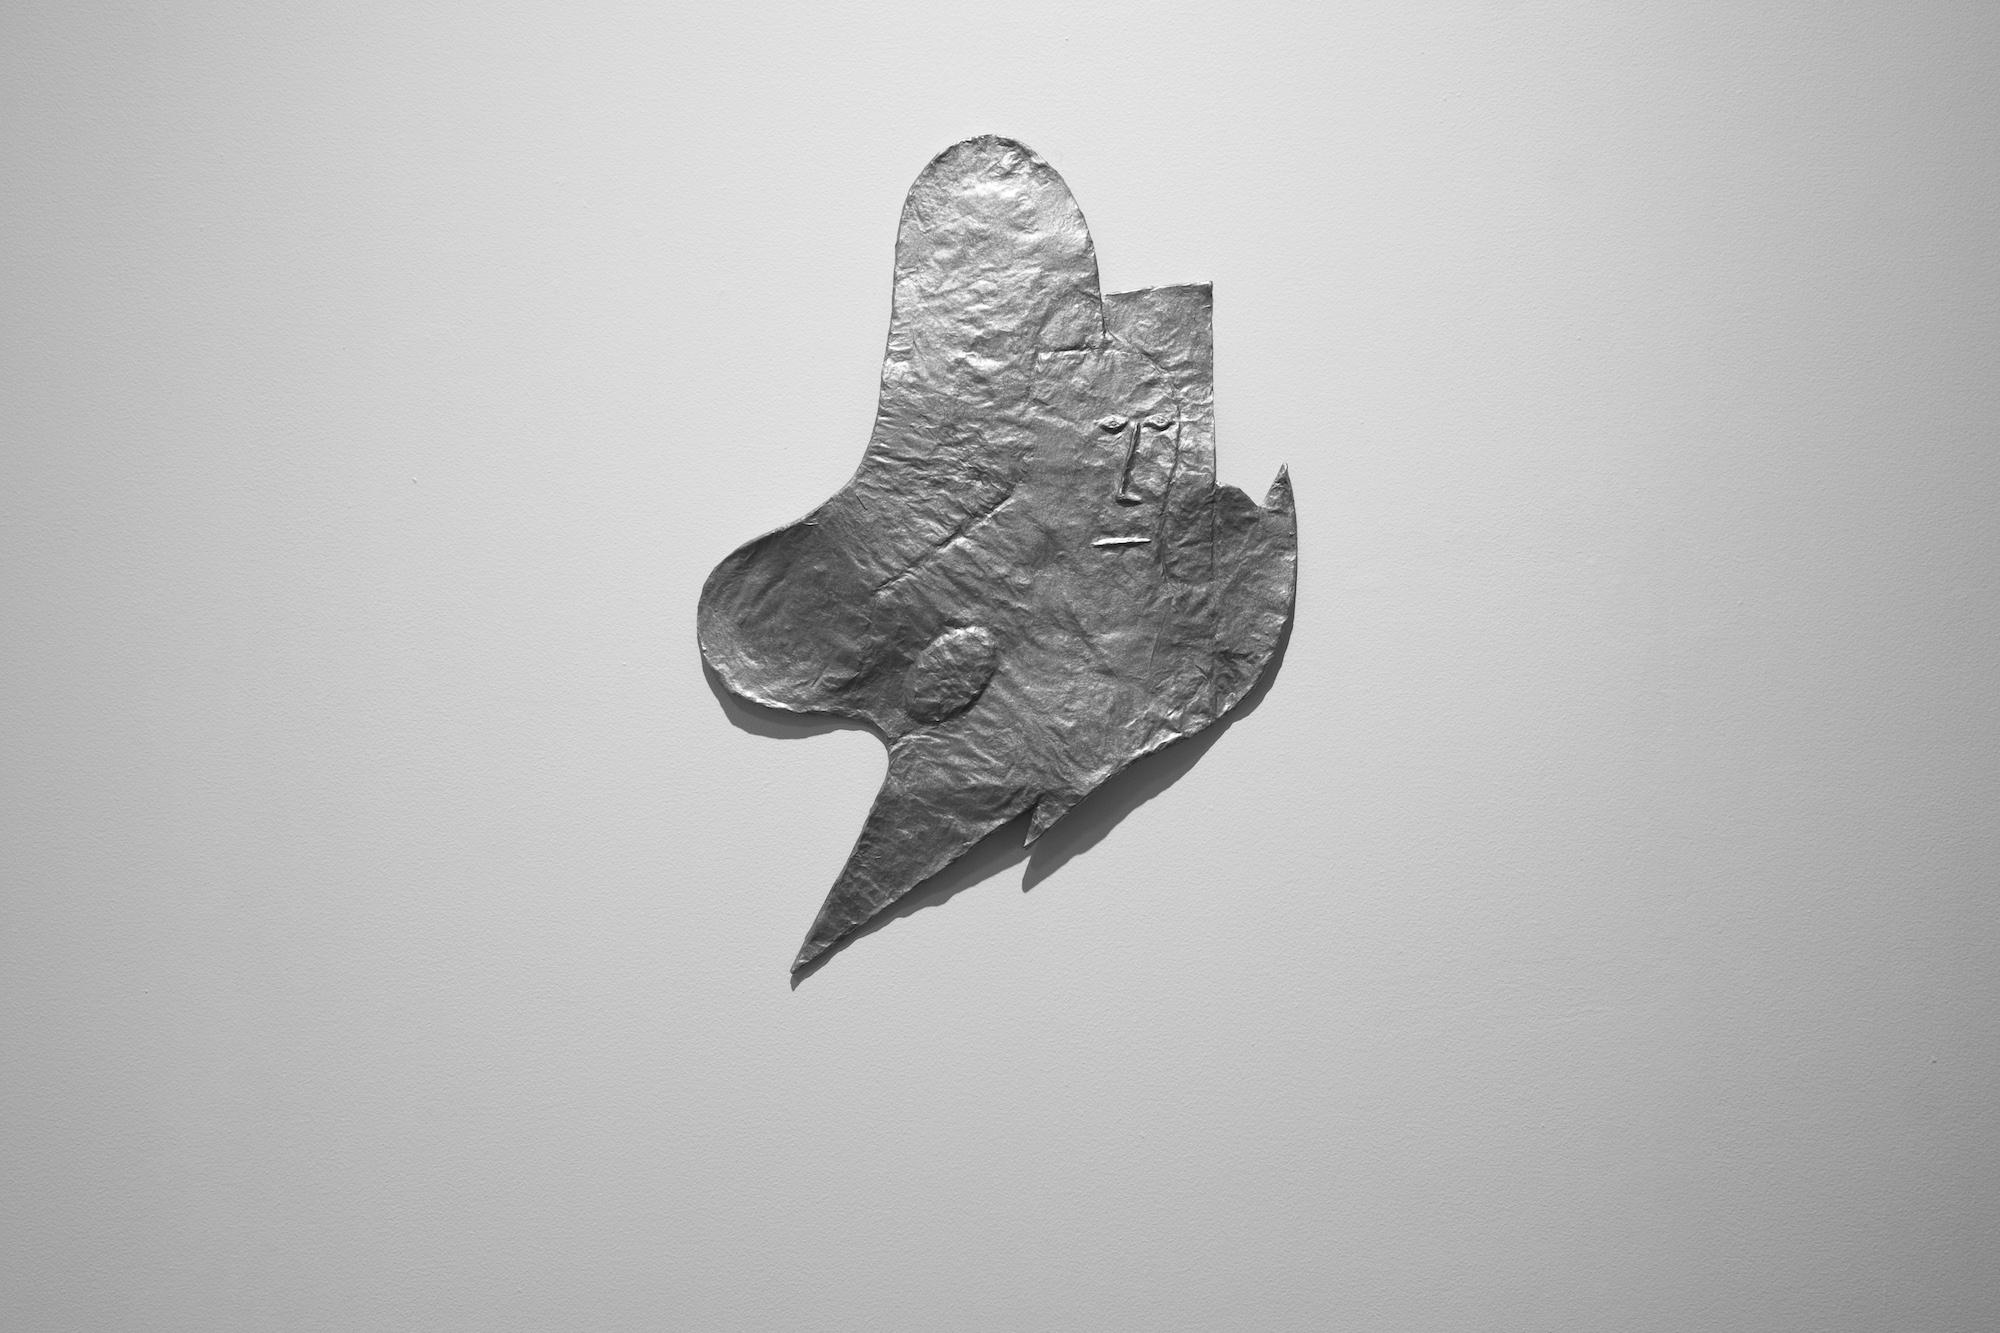 Rodrigo Hernández  Finally free 2017 Papier-maché, wood, metal lacquer 71 x 50 x 2.5 cm